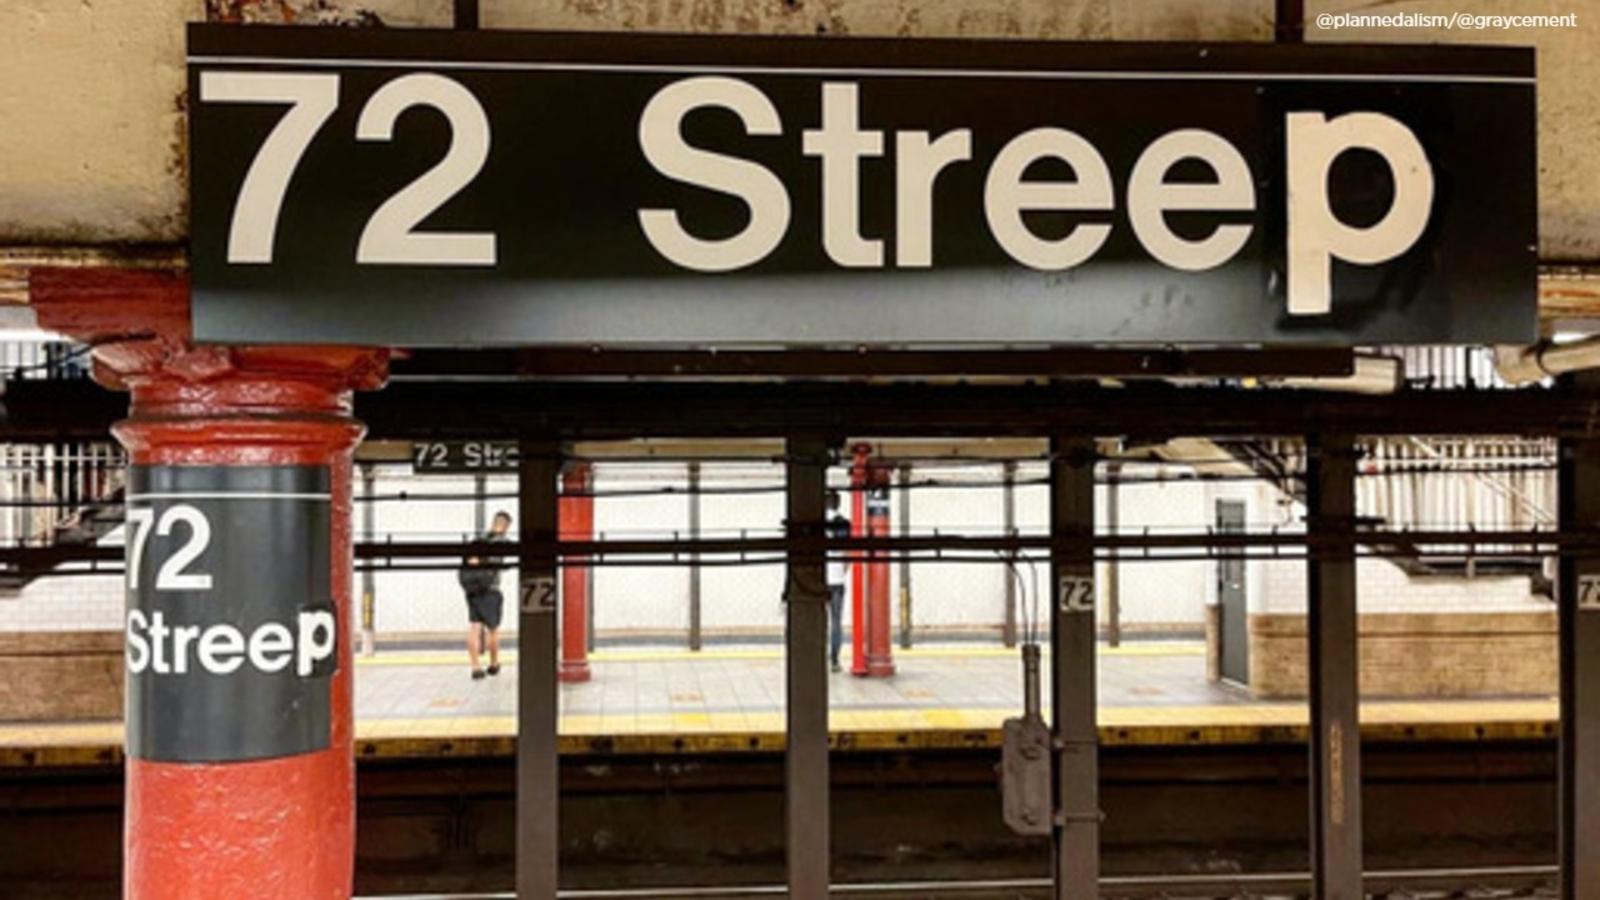 New York City subway station gets makeover for Meryl Streep's birthday